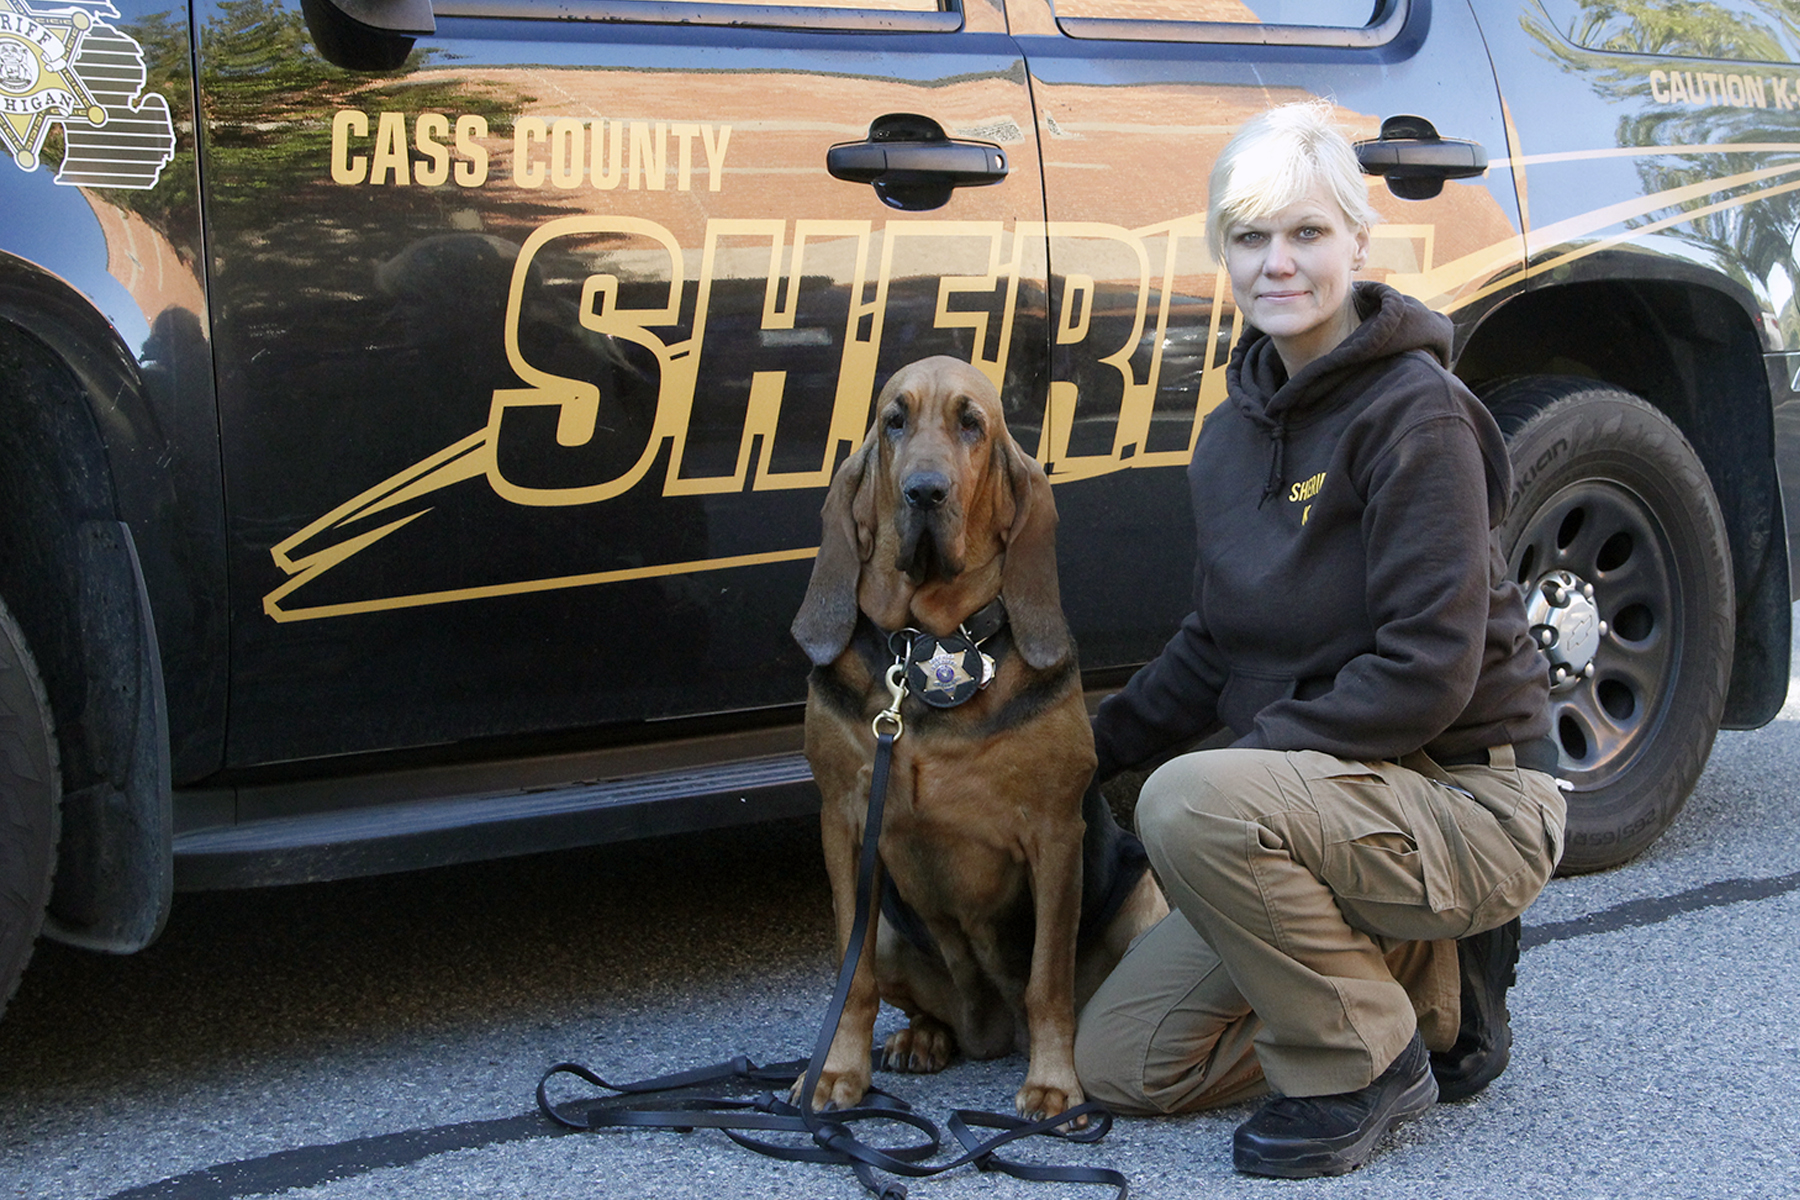 6 bloodhound cass county 6.jpg